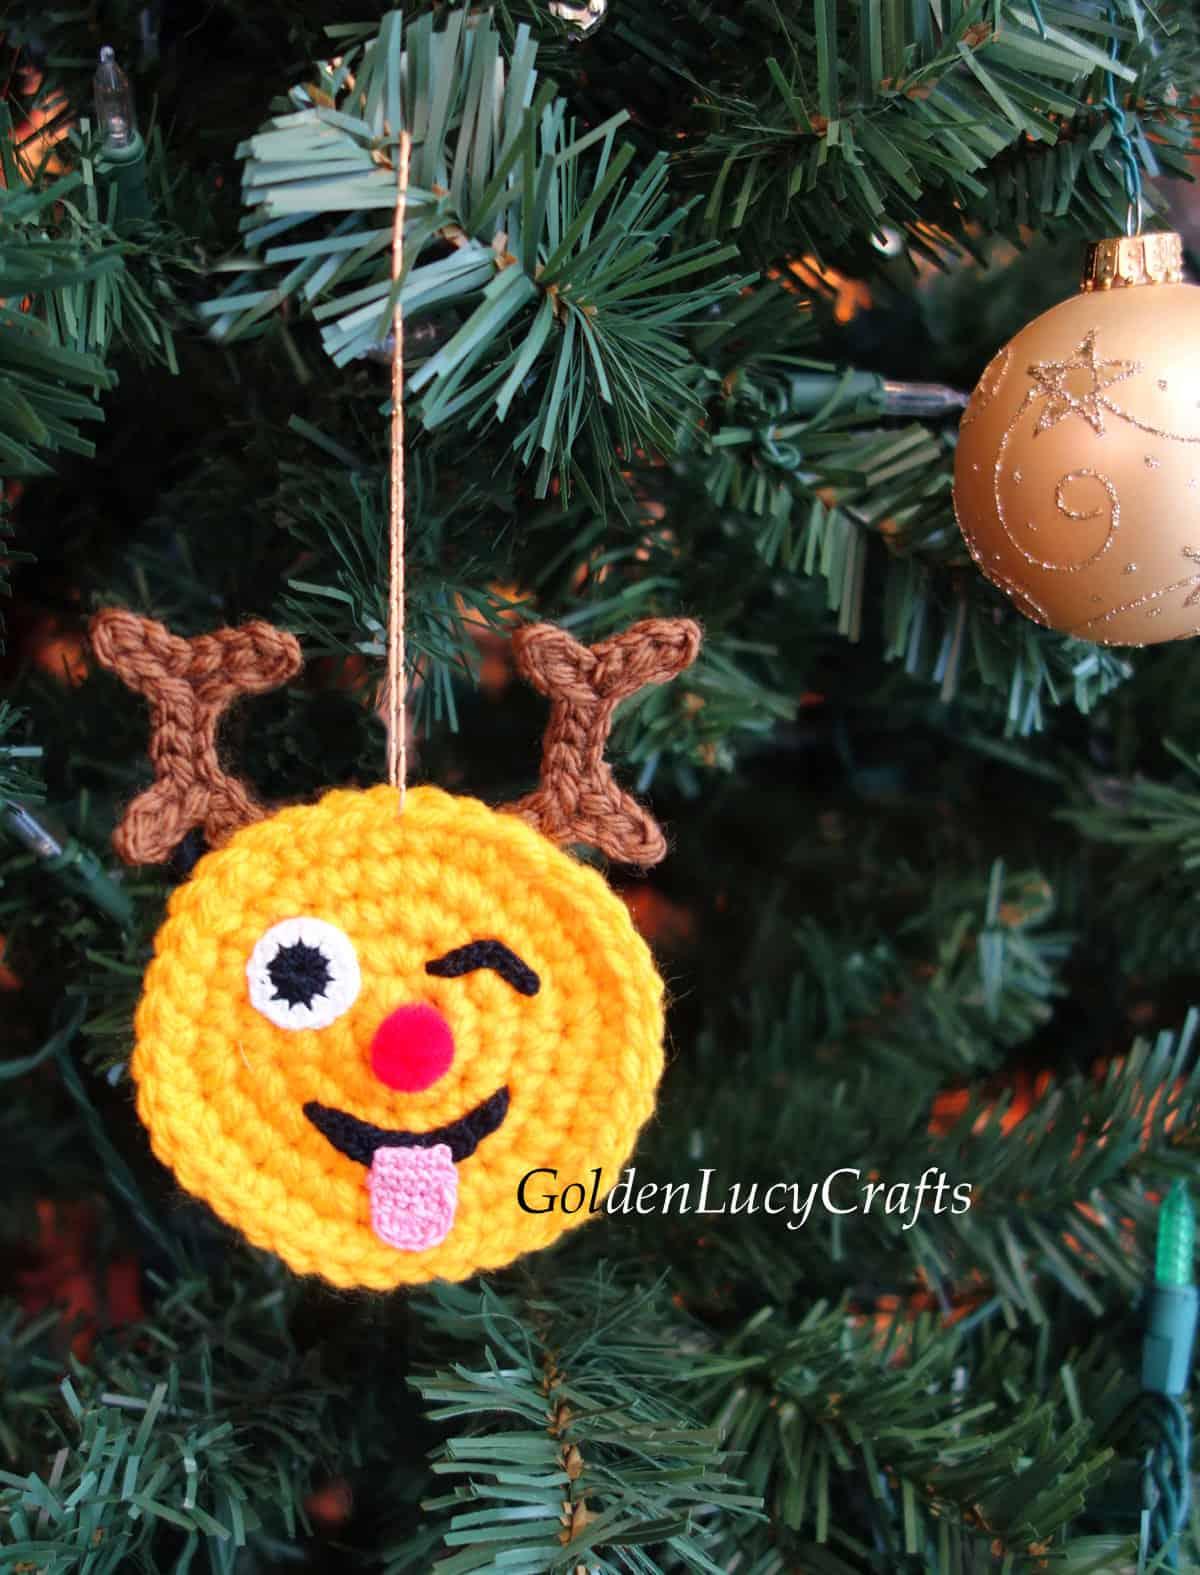 Crochet reindeer emoji ornament hanging on Christmas tree.